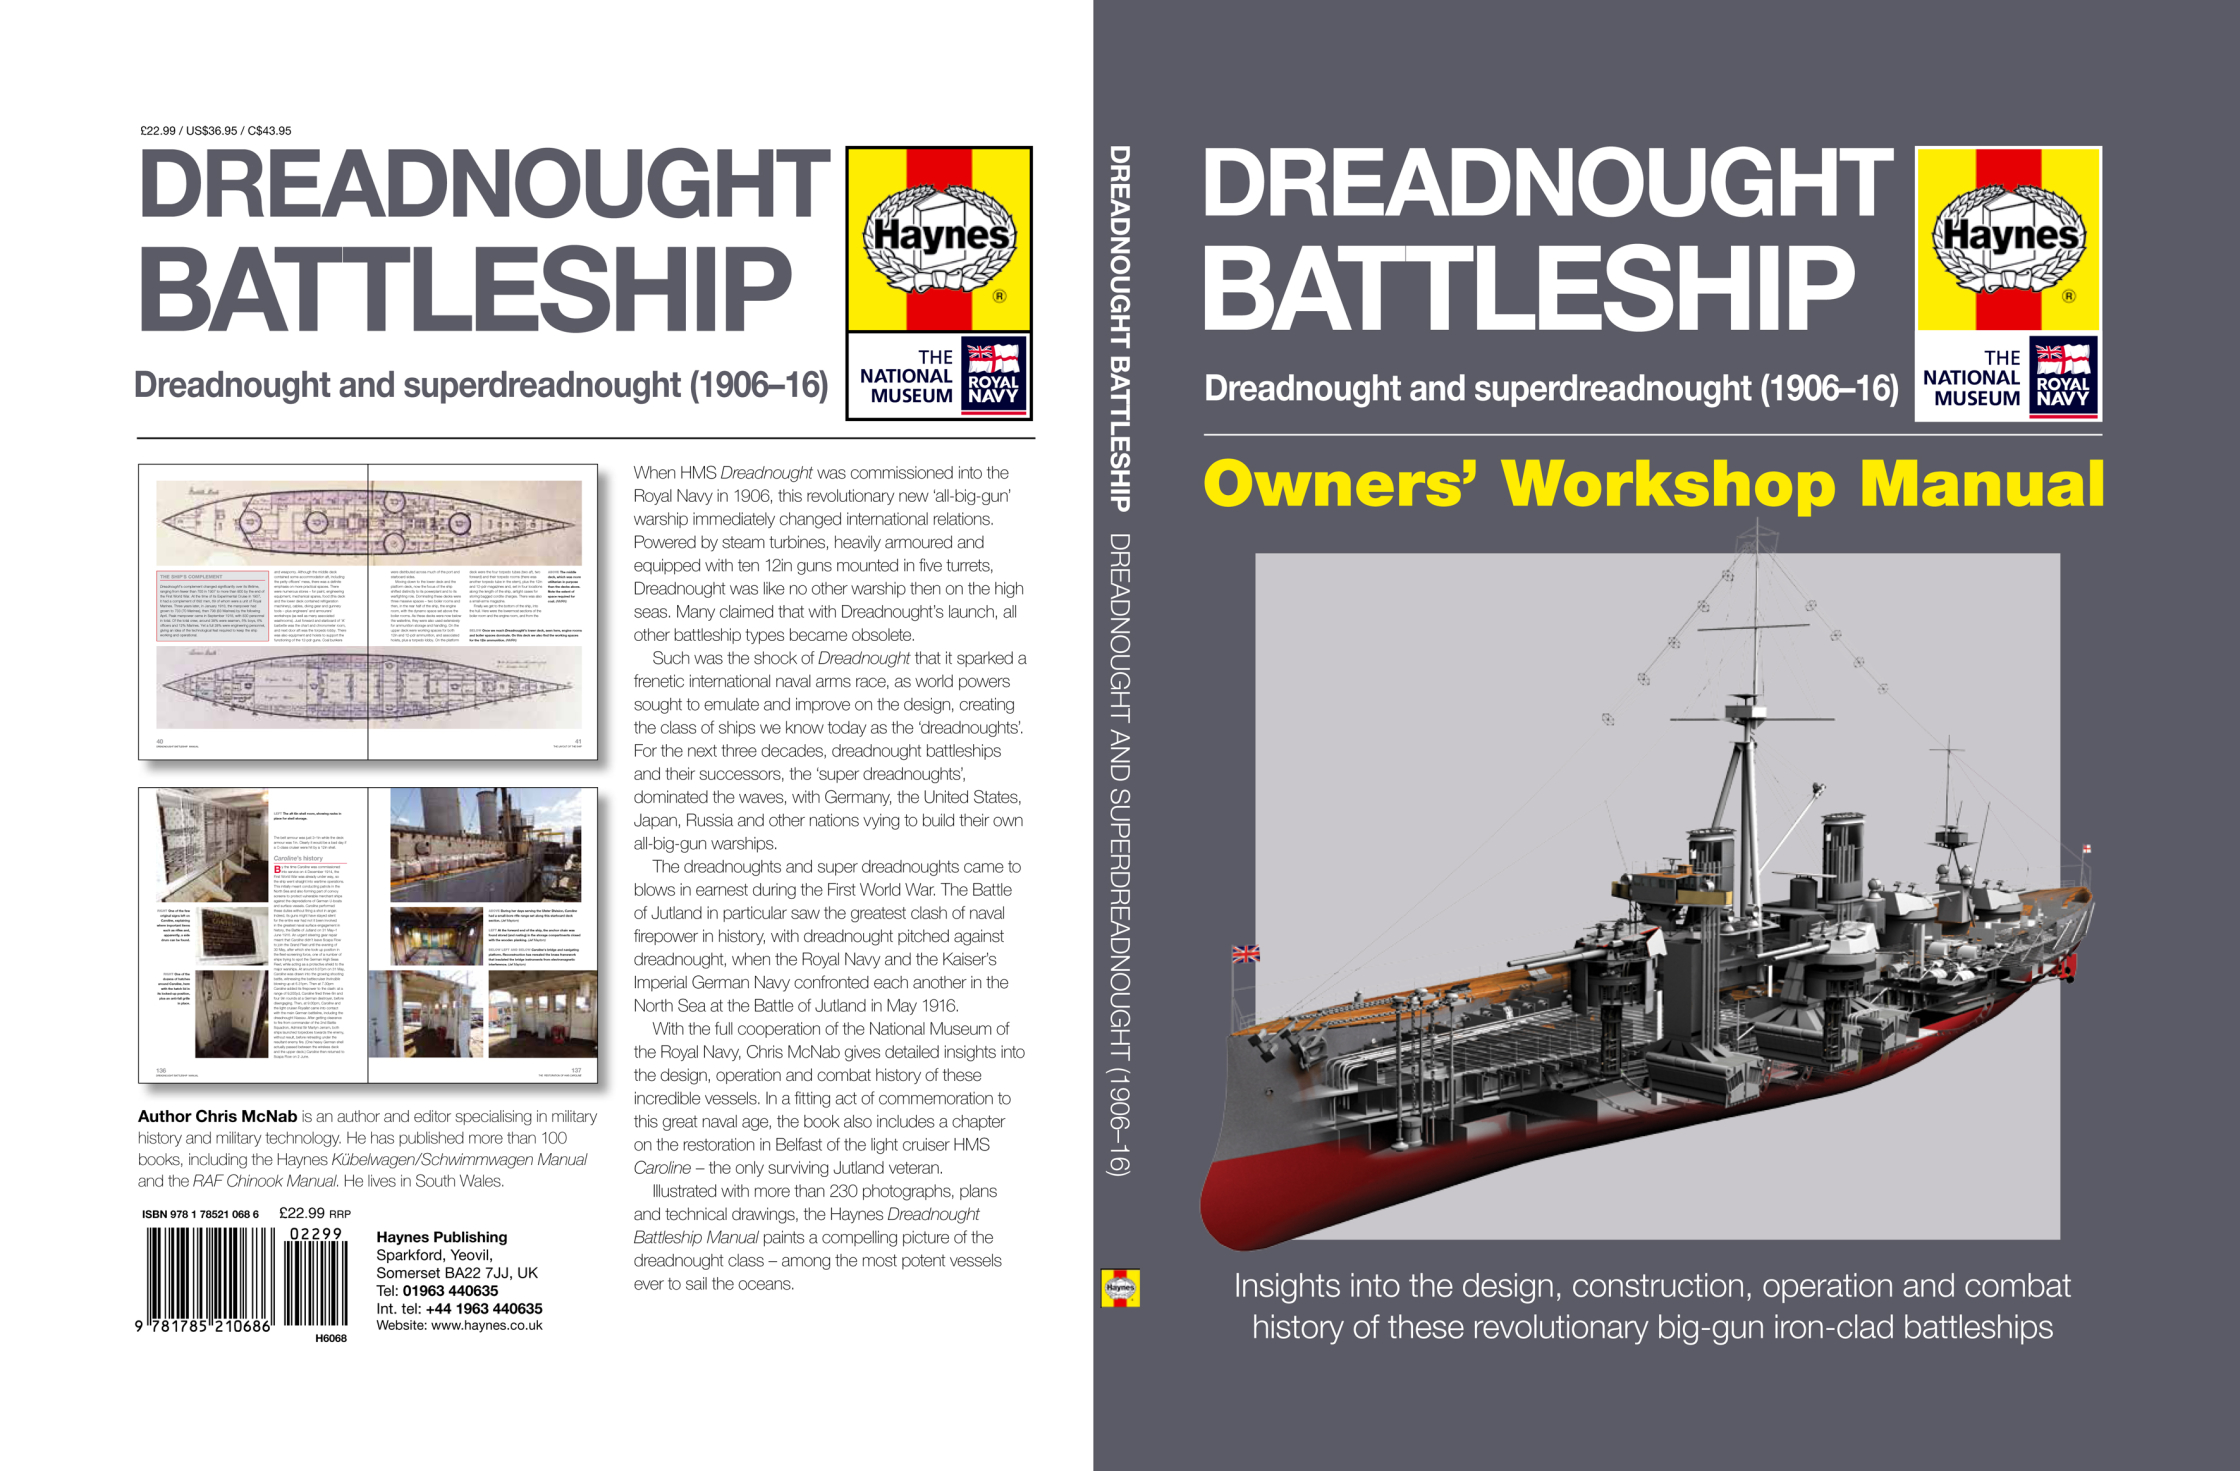 H6068_Dreadnought_cover.jpg